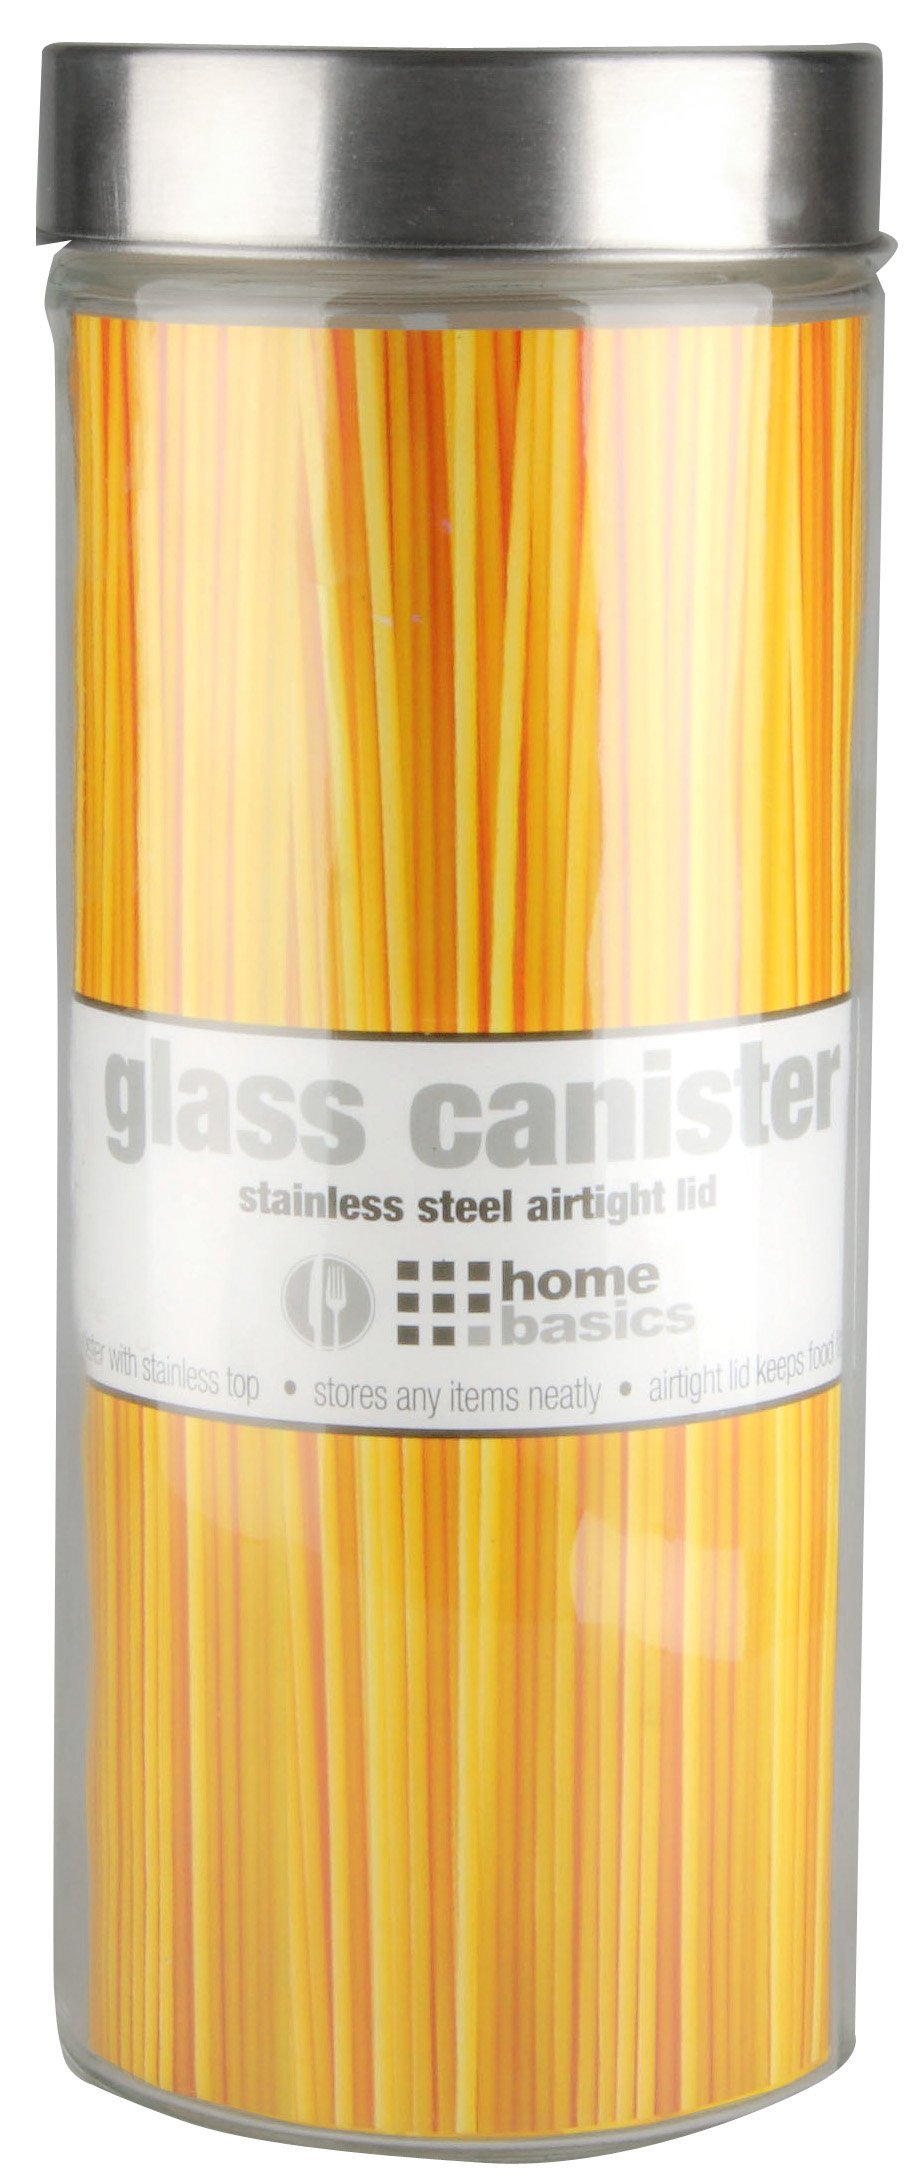 Home Basics Glass Jar, Round, X-Large